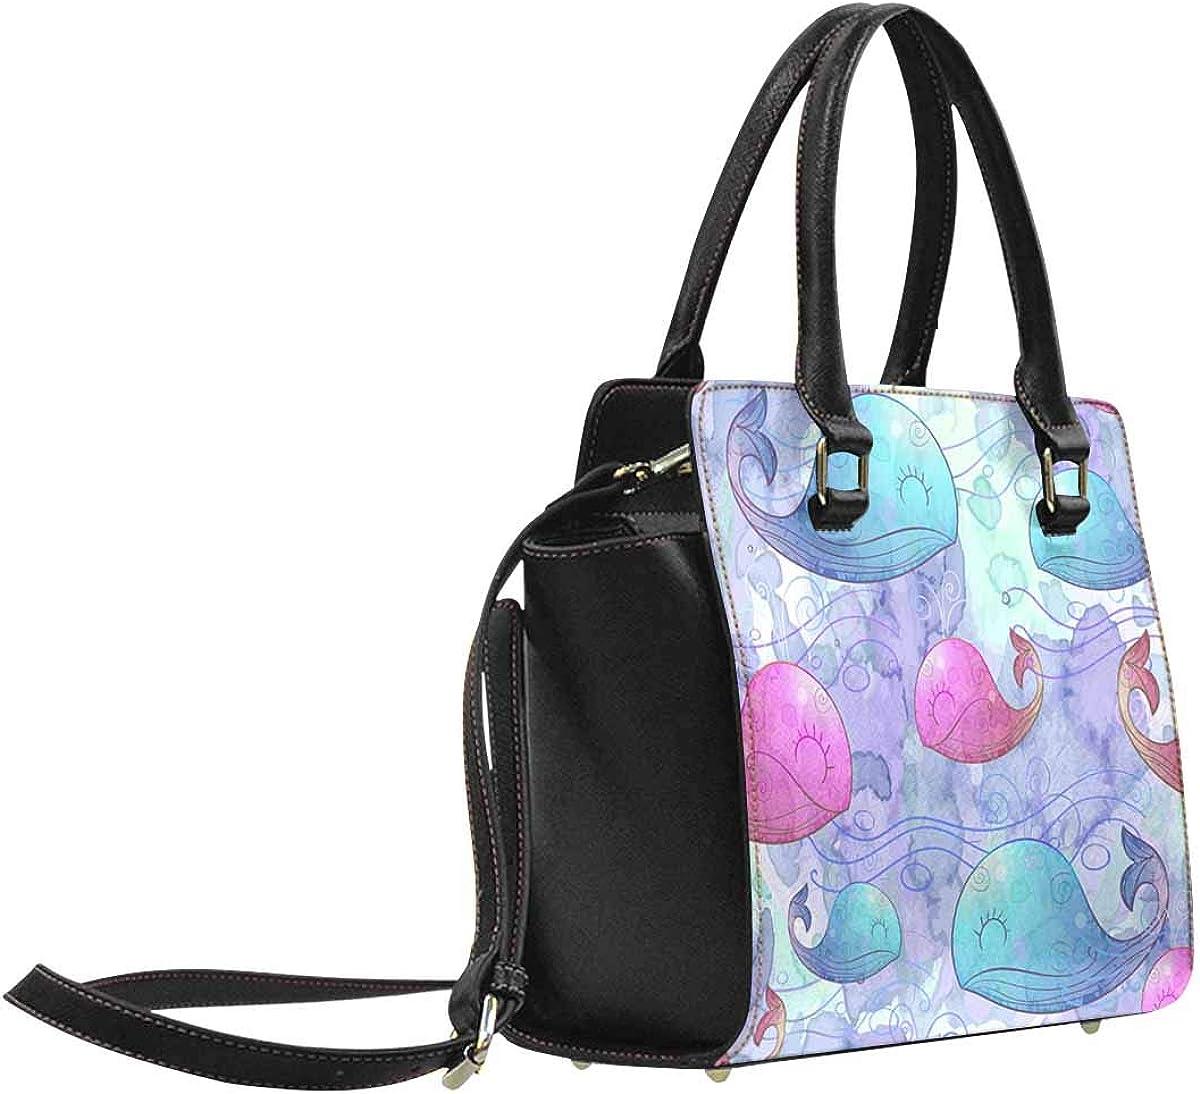 INTERESTPRINT a Pair of Peacocks Women Top Handle Satchel Handbags Tote Bag